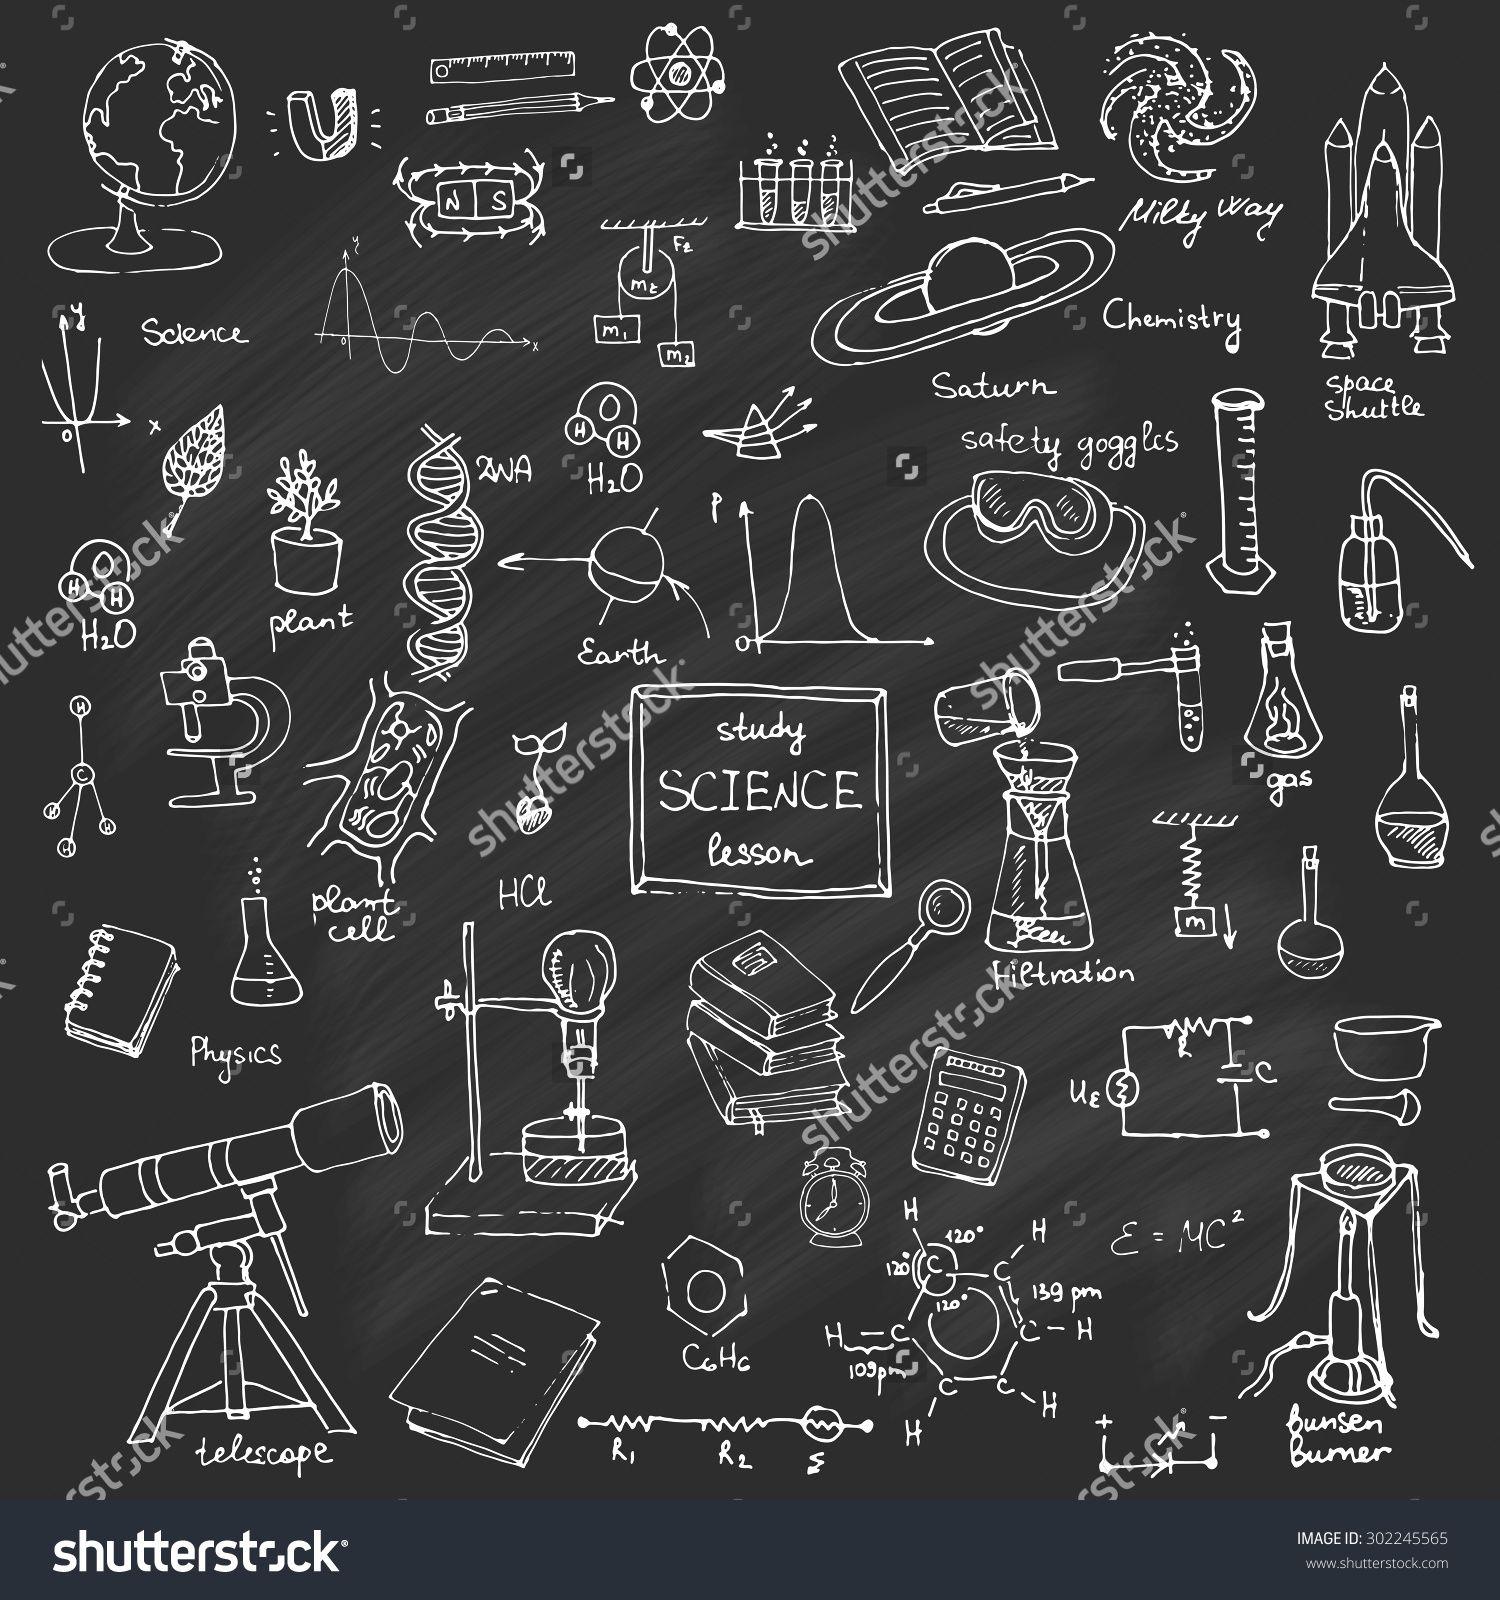 Blackboard clipart science. Freehand drawing school items